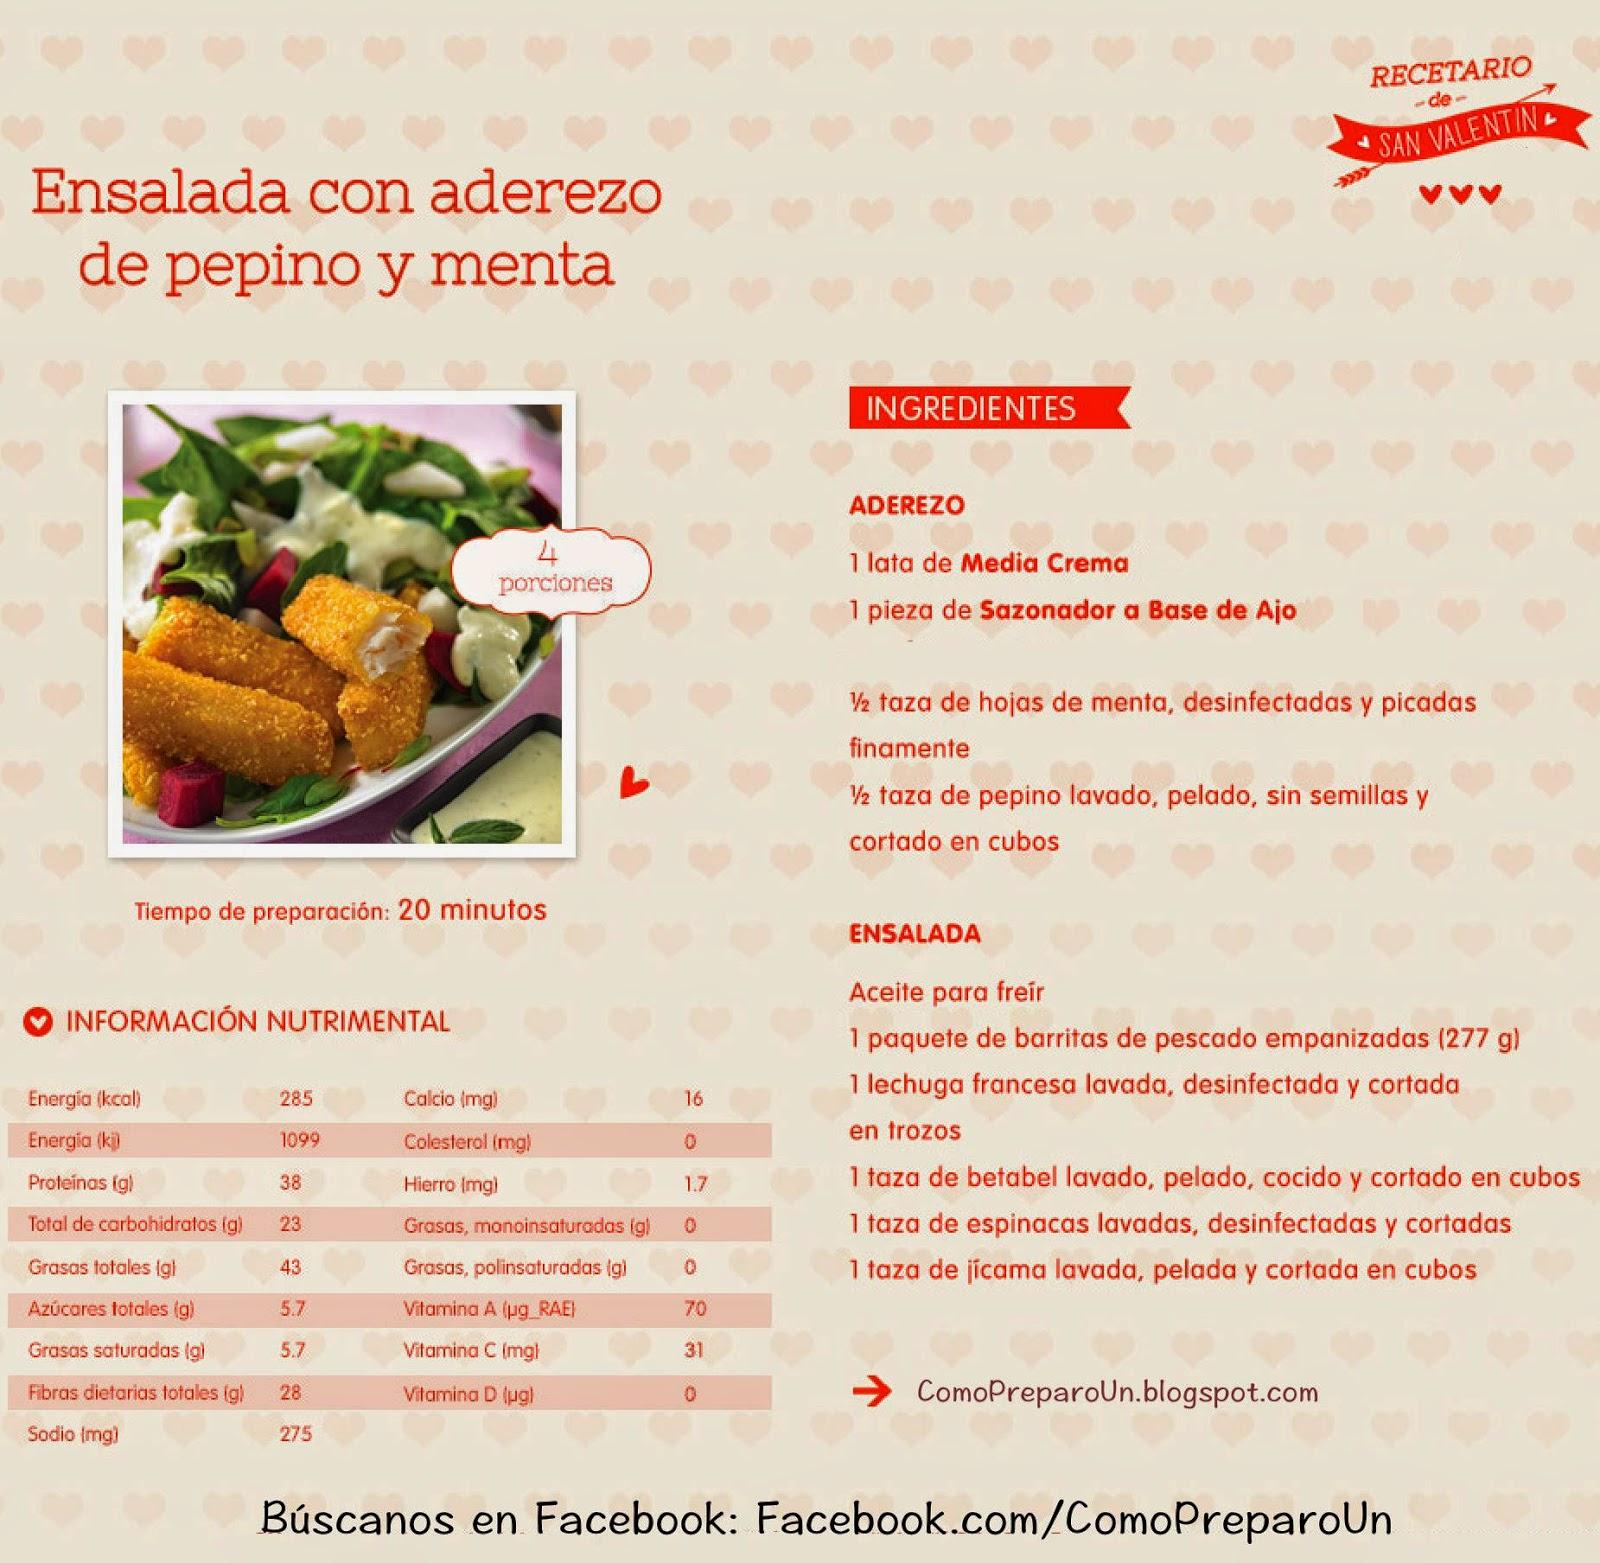 RECETAS DE COMIDAS PARA SAN VALENTIN: Ensalada con aderezo de pepino y menta COCINA FACIL